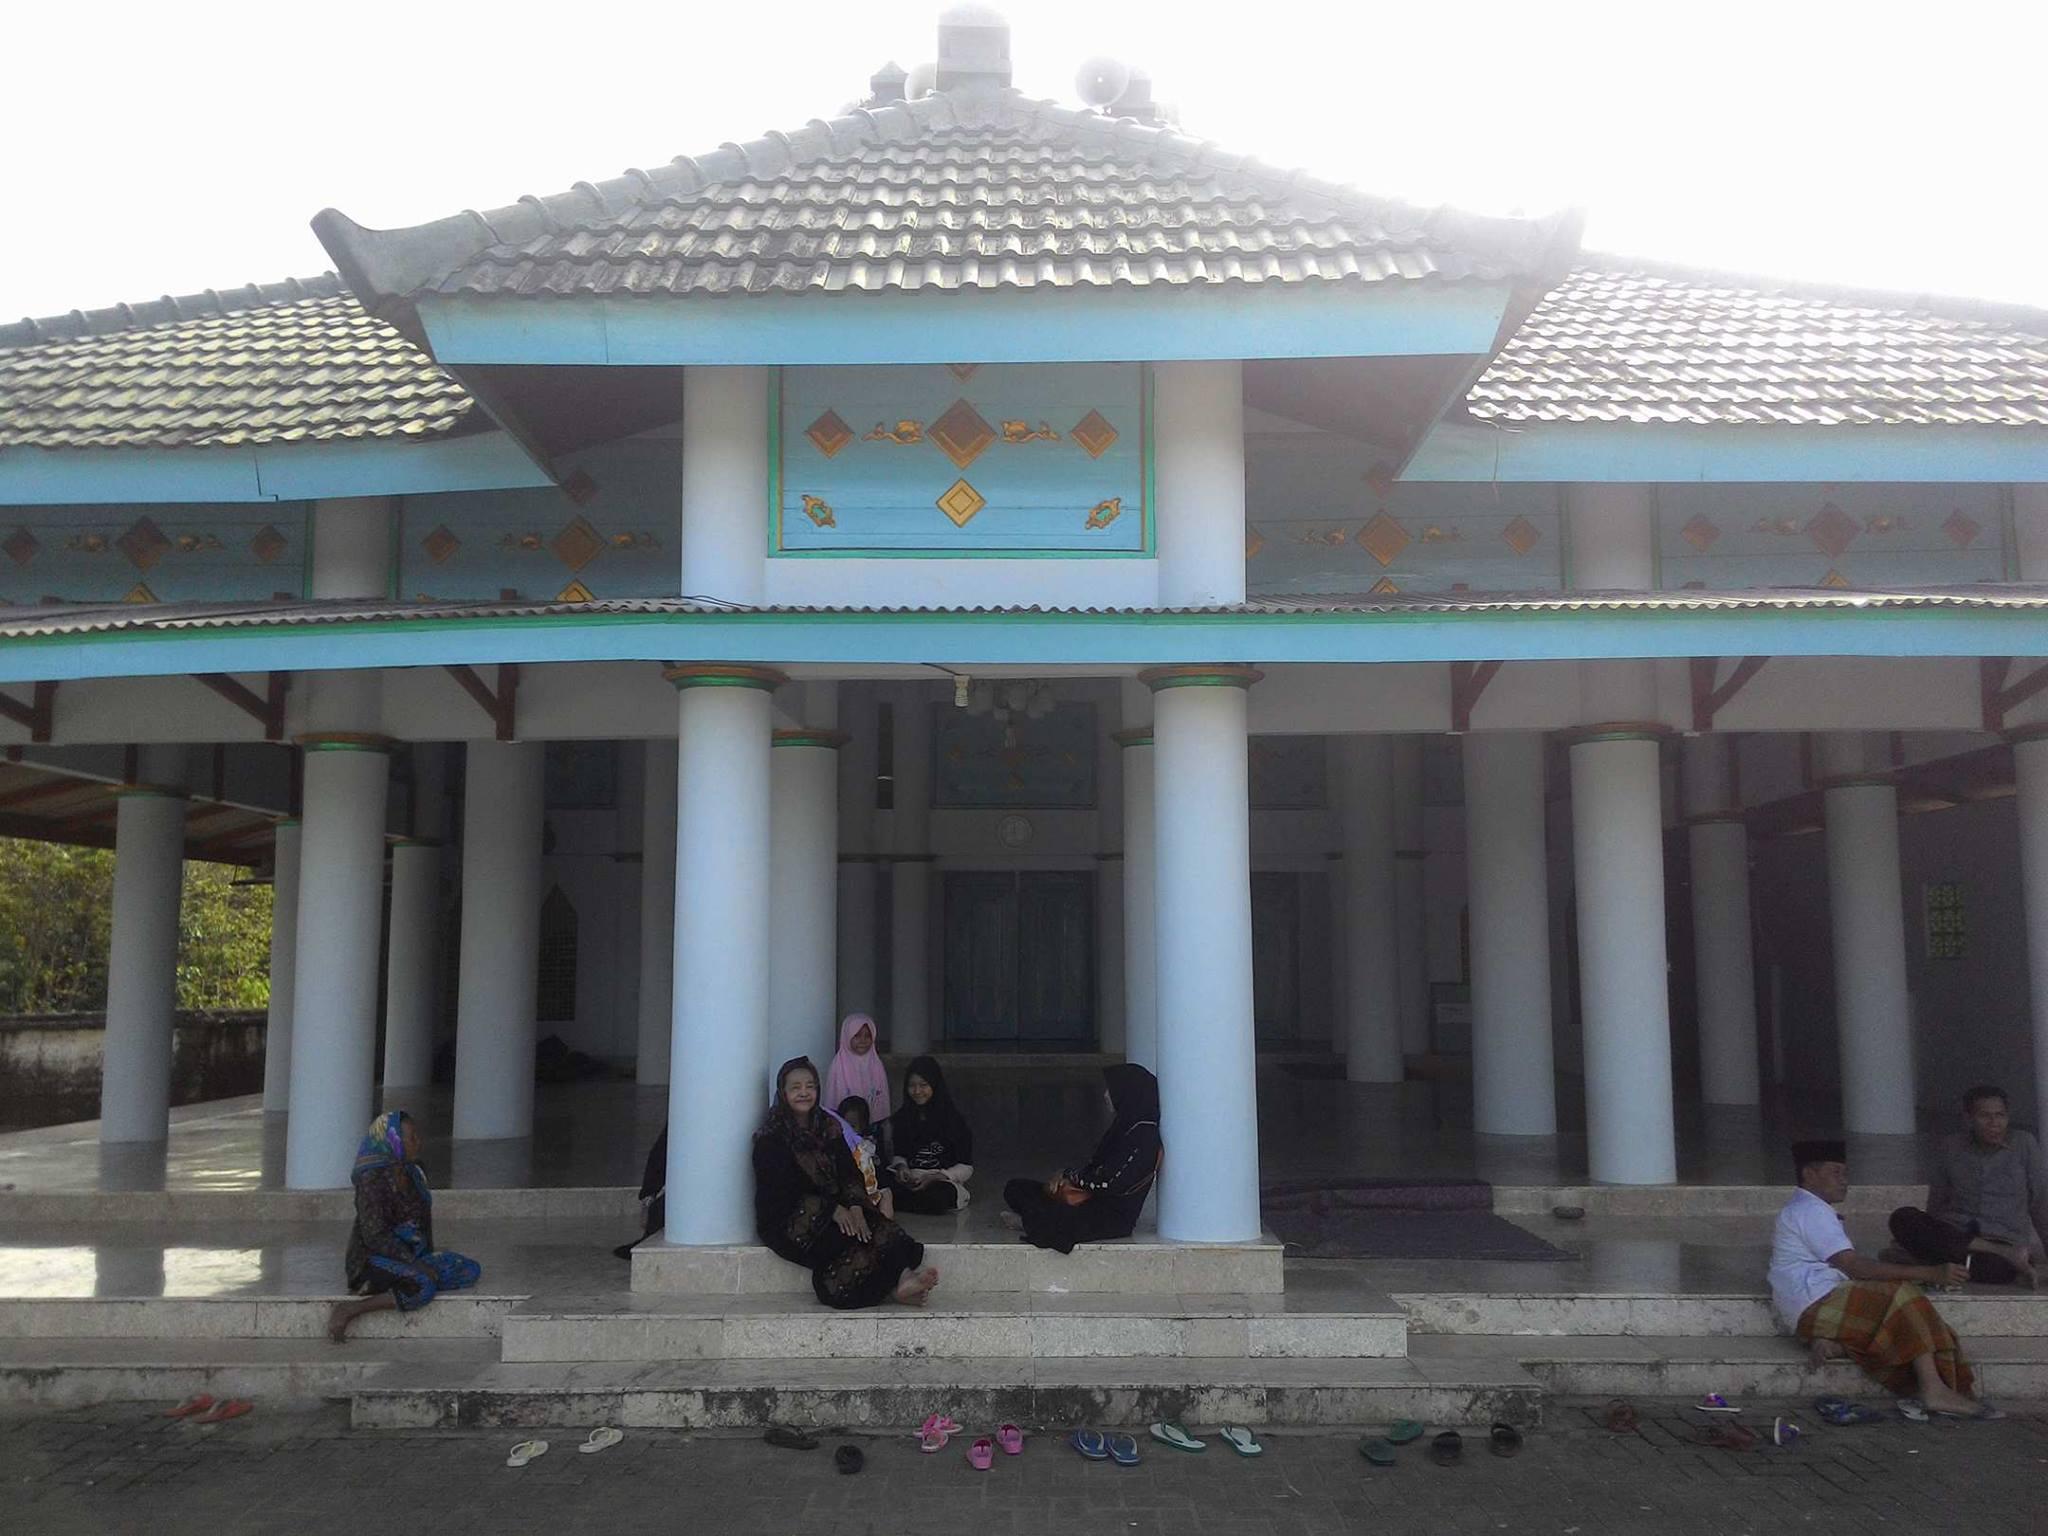 Kabupaten Sumenep Masjid Agung Batuampar Lebih Tua Kab